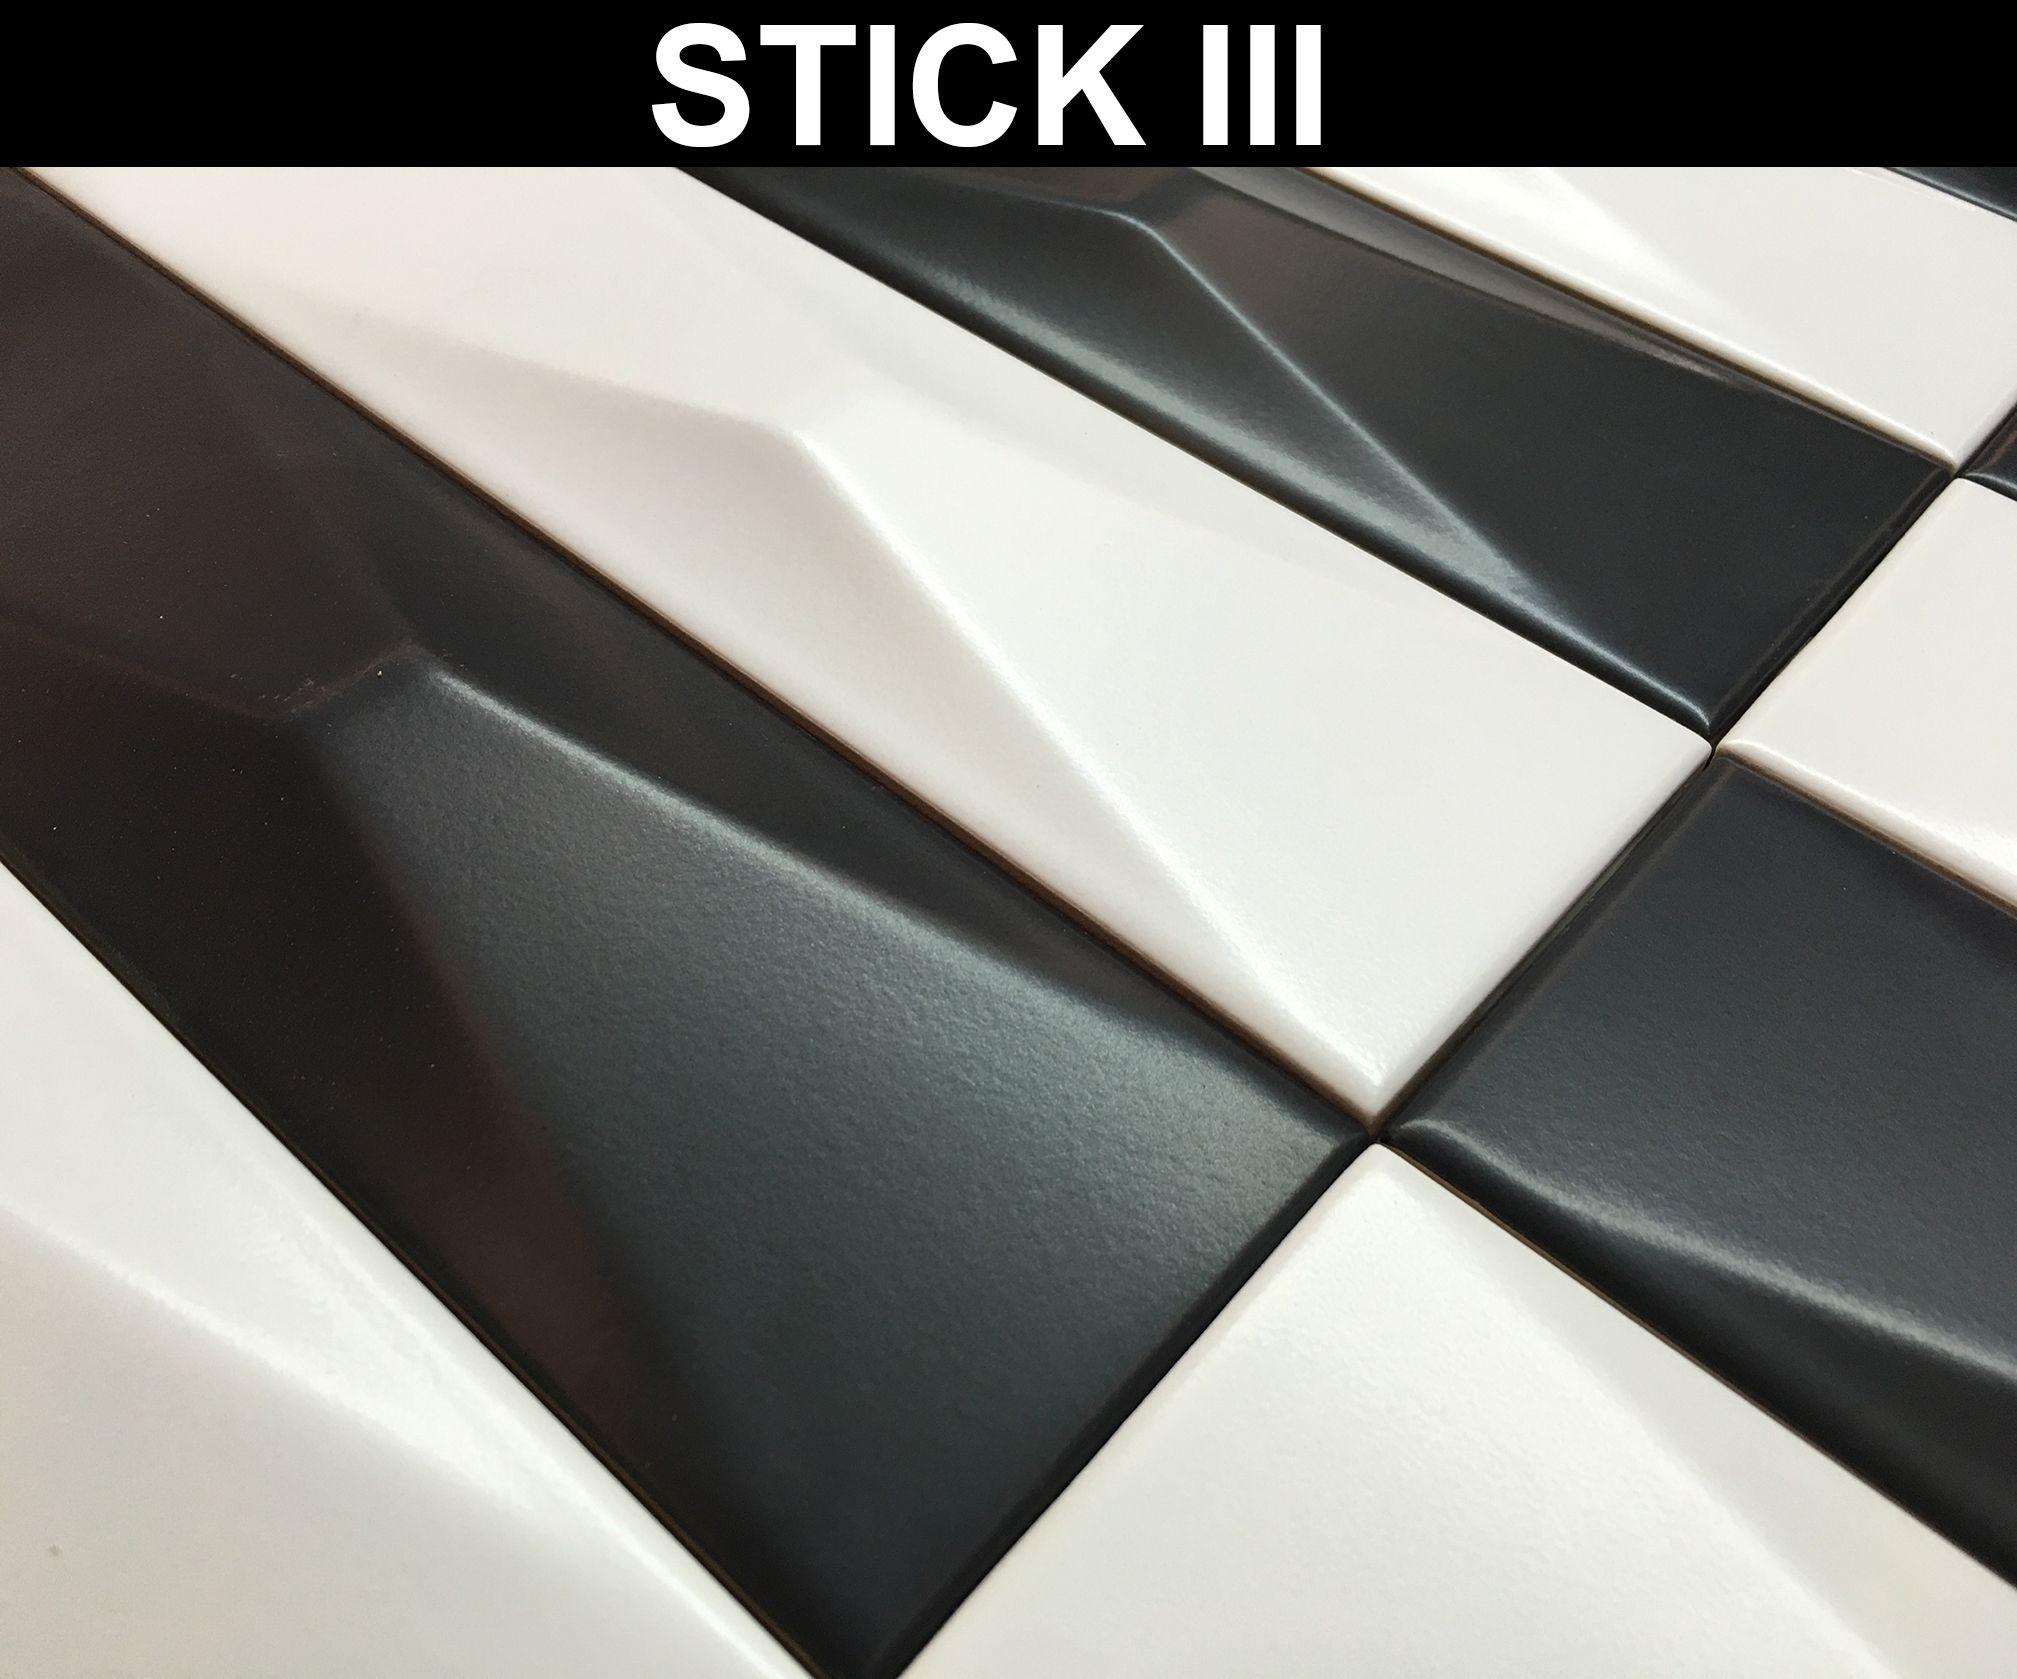 Detail Ceramic Relief 2 46 X 14 76 In Colours White Grey And Black Detalle Relieve Ceramico De 6 25 X 37 5 Cm En Colores Blanco G Azulejos Colores Estilos